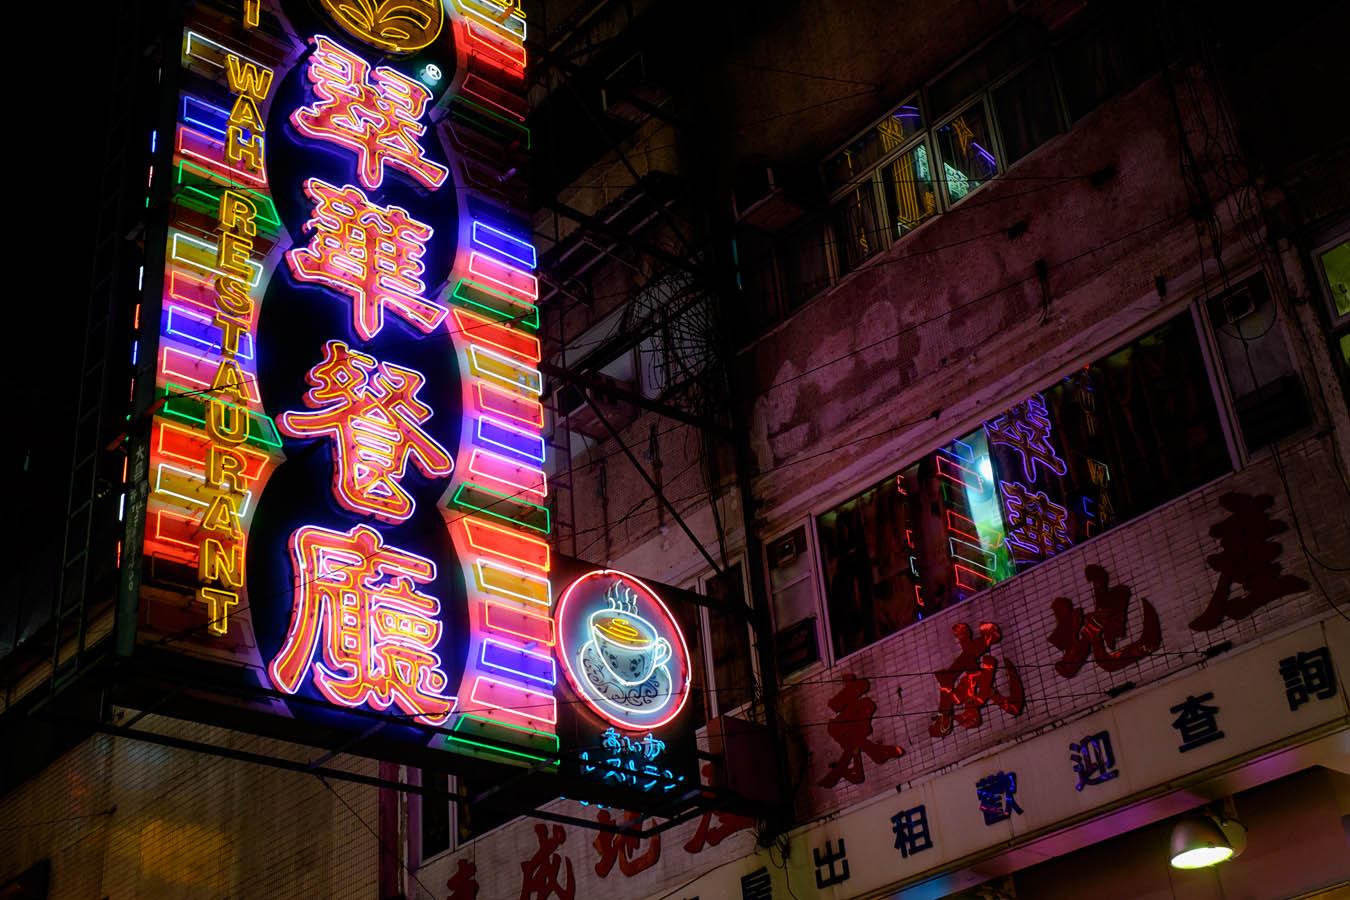 Hong Kong NEON, photography by Sharon Blance